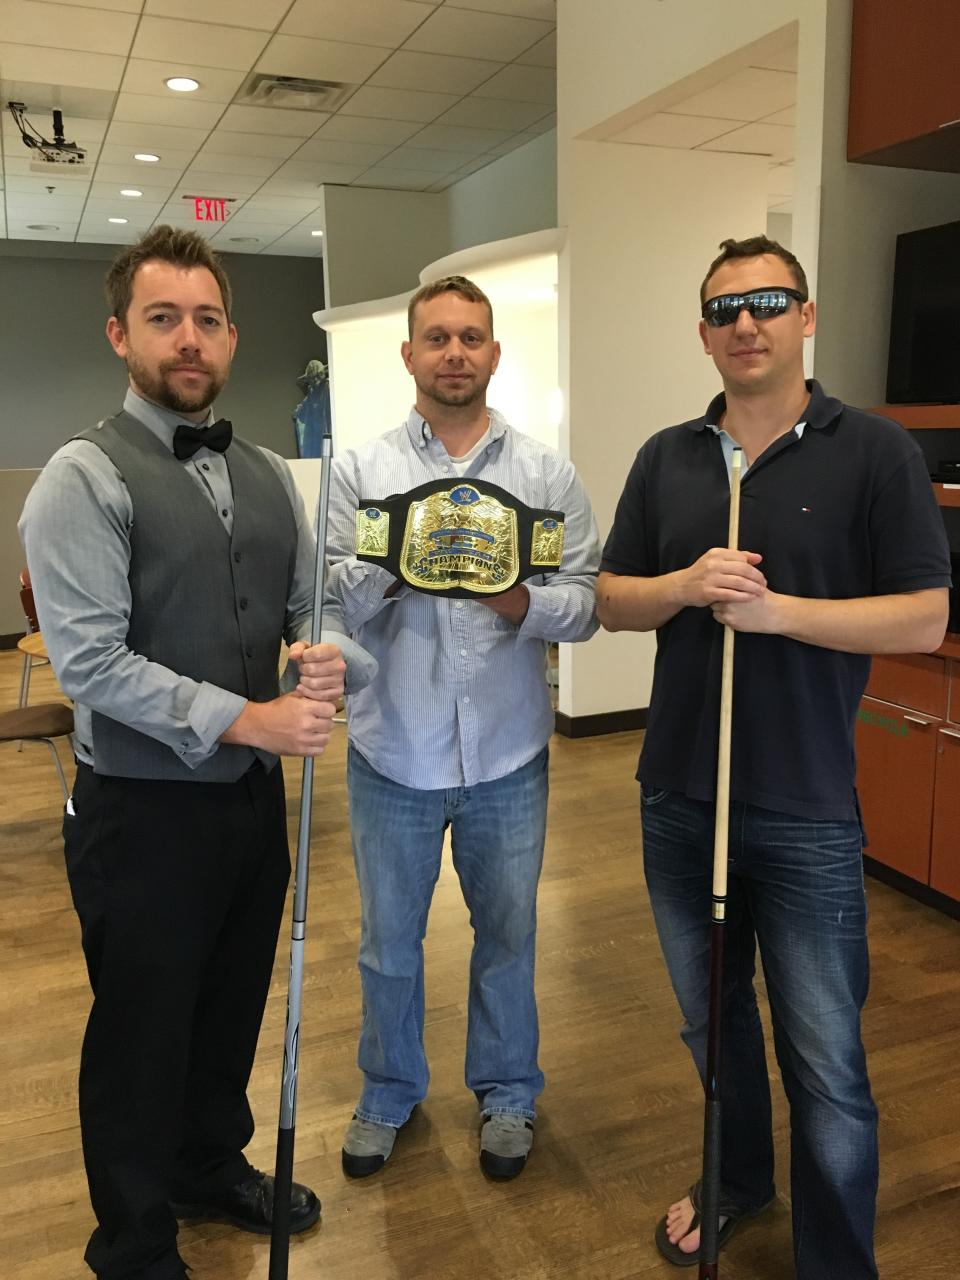 Pool tournament showdown